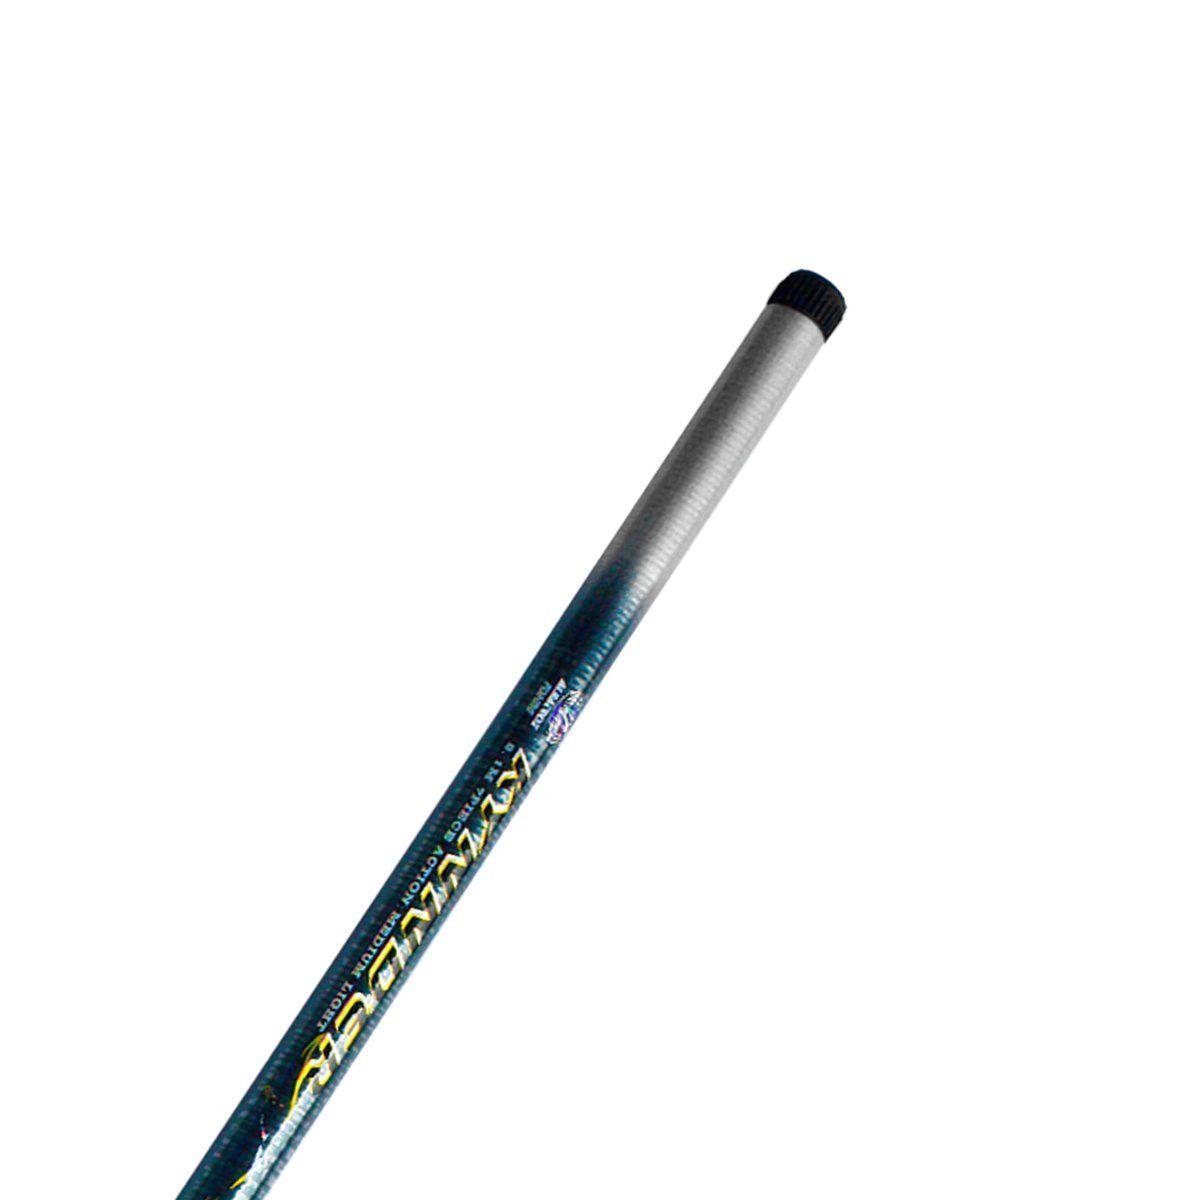 Vara Telescópica Albatroz Fishing Kynnder 3311 3,30m 11s